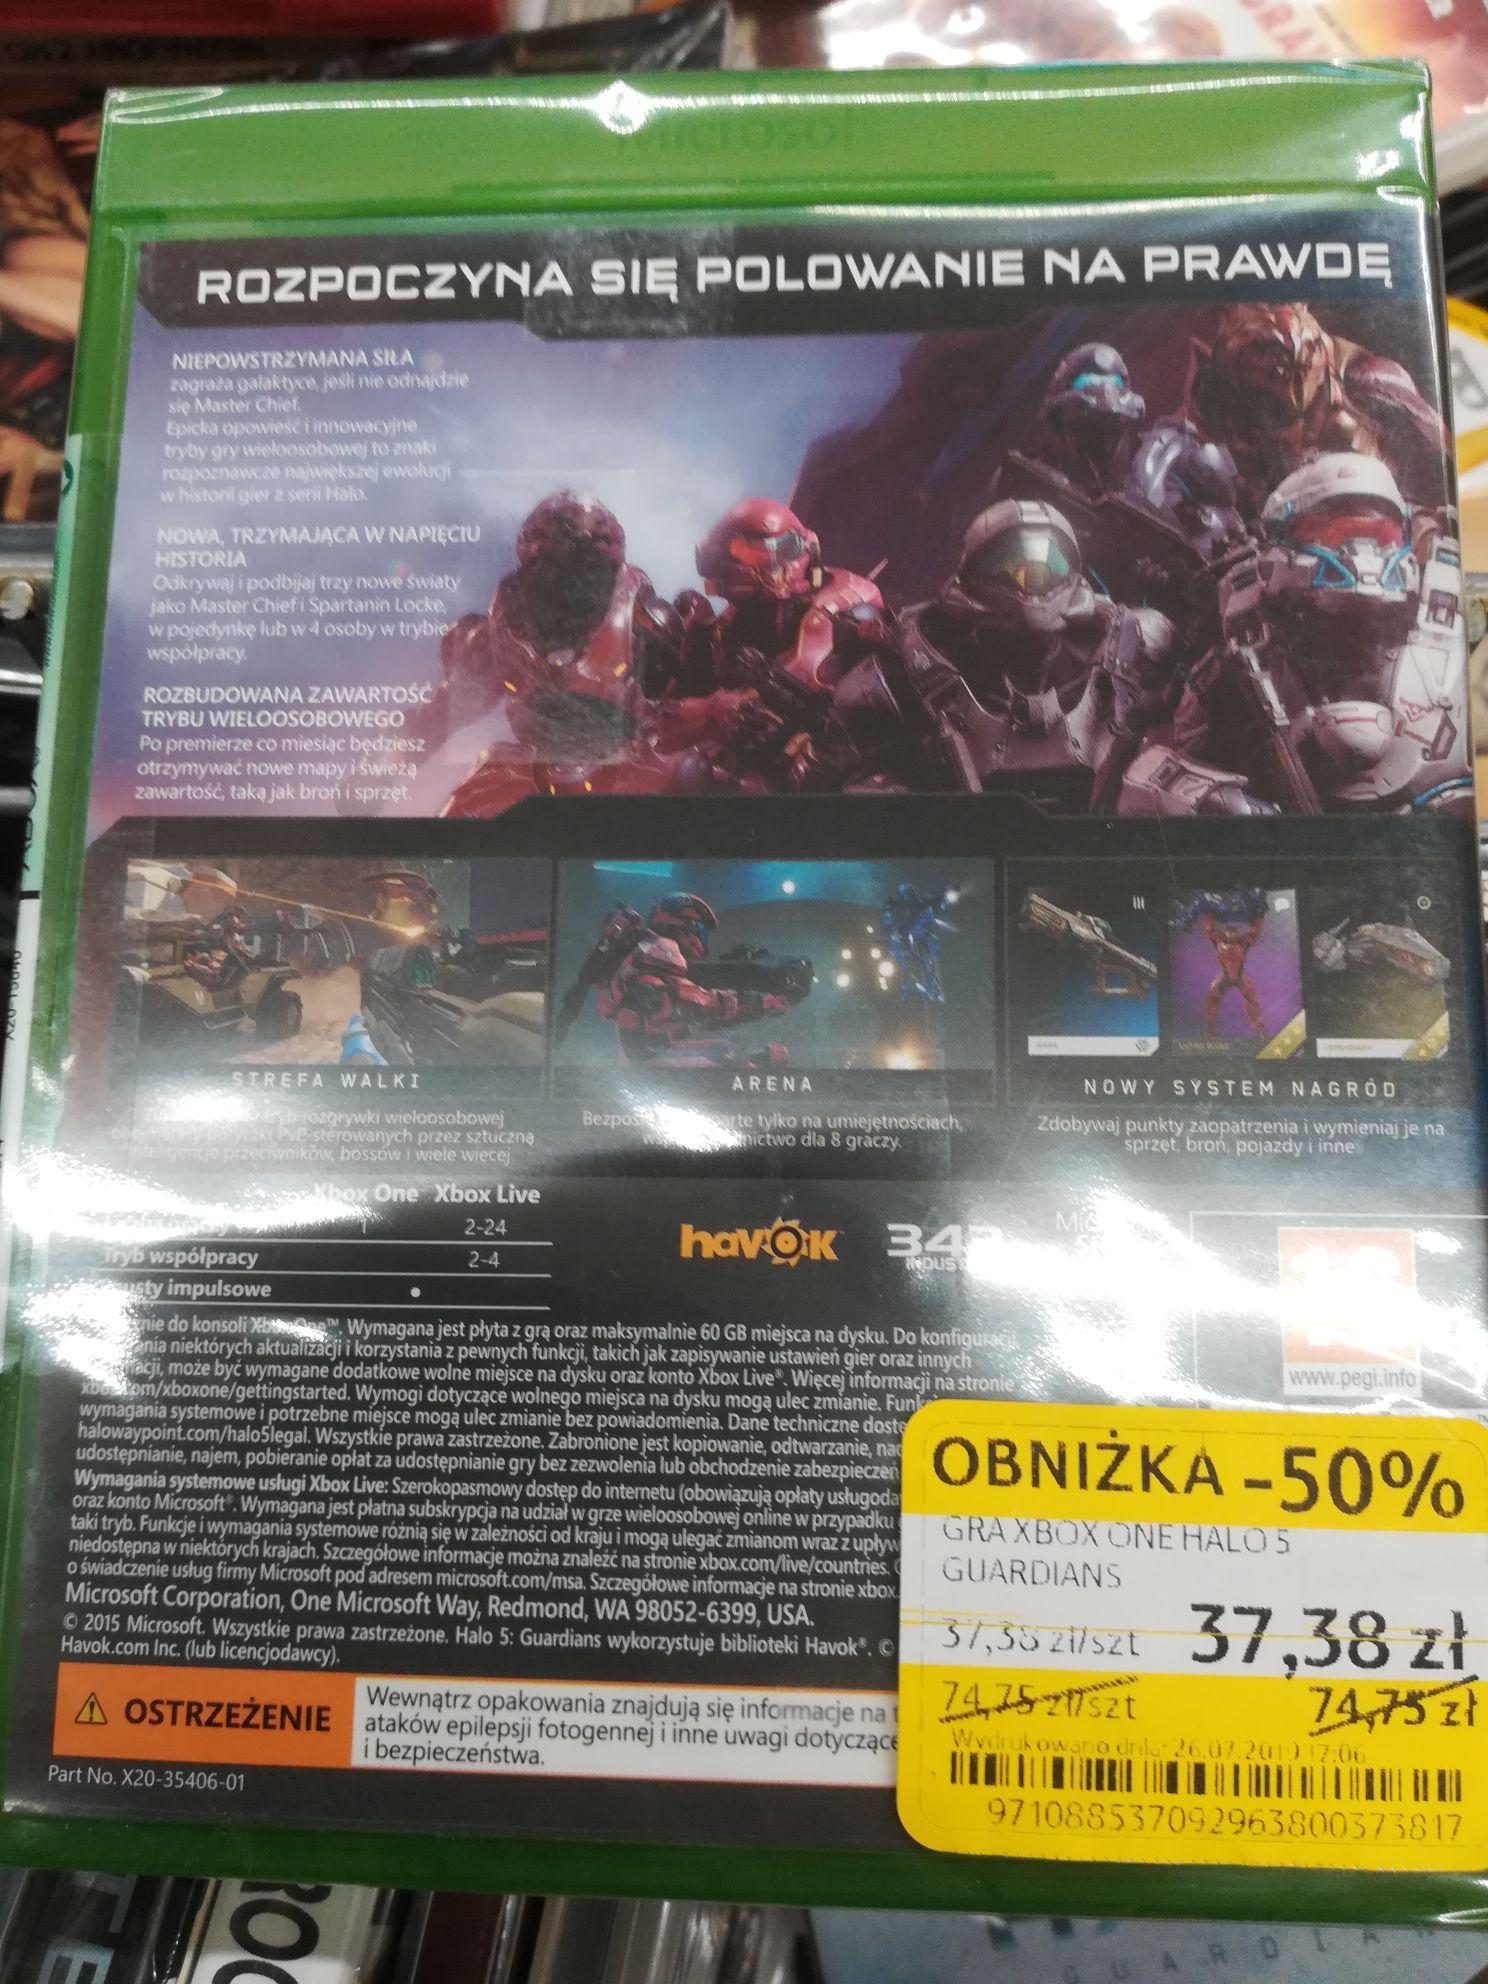 Halo 5 Xbox One Tesco Ruda Śląska 1go maja